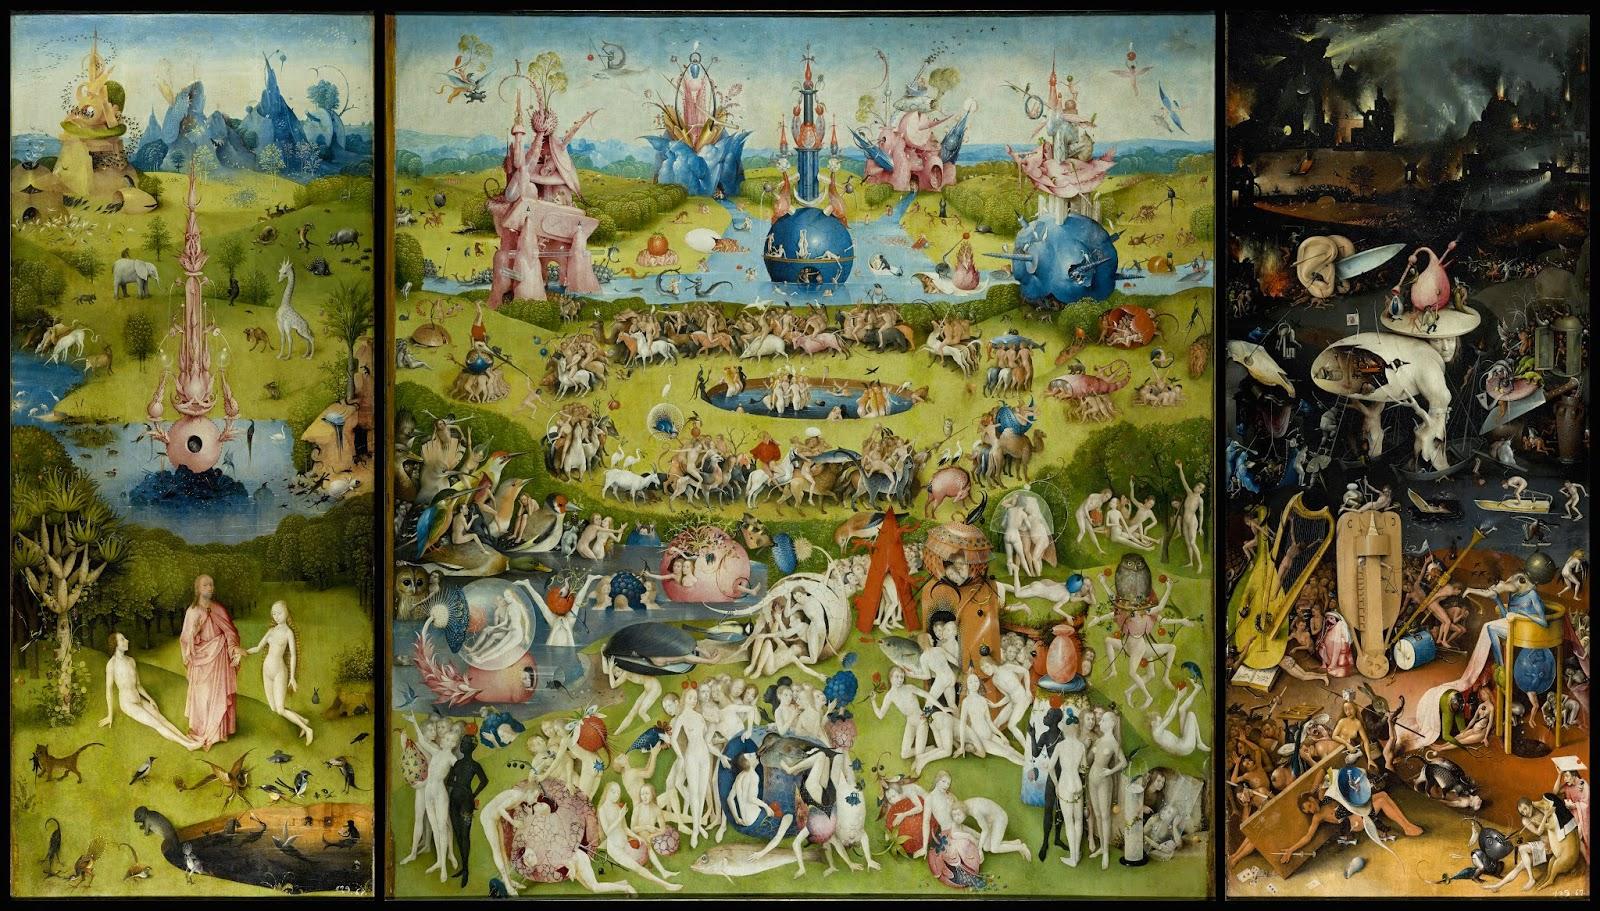 Antblog hieronymus bosch il giardino delle delizie - Il giardino delle delizie bosch ...